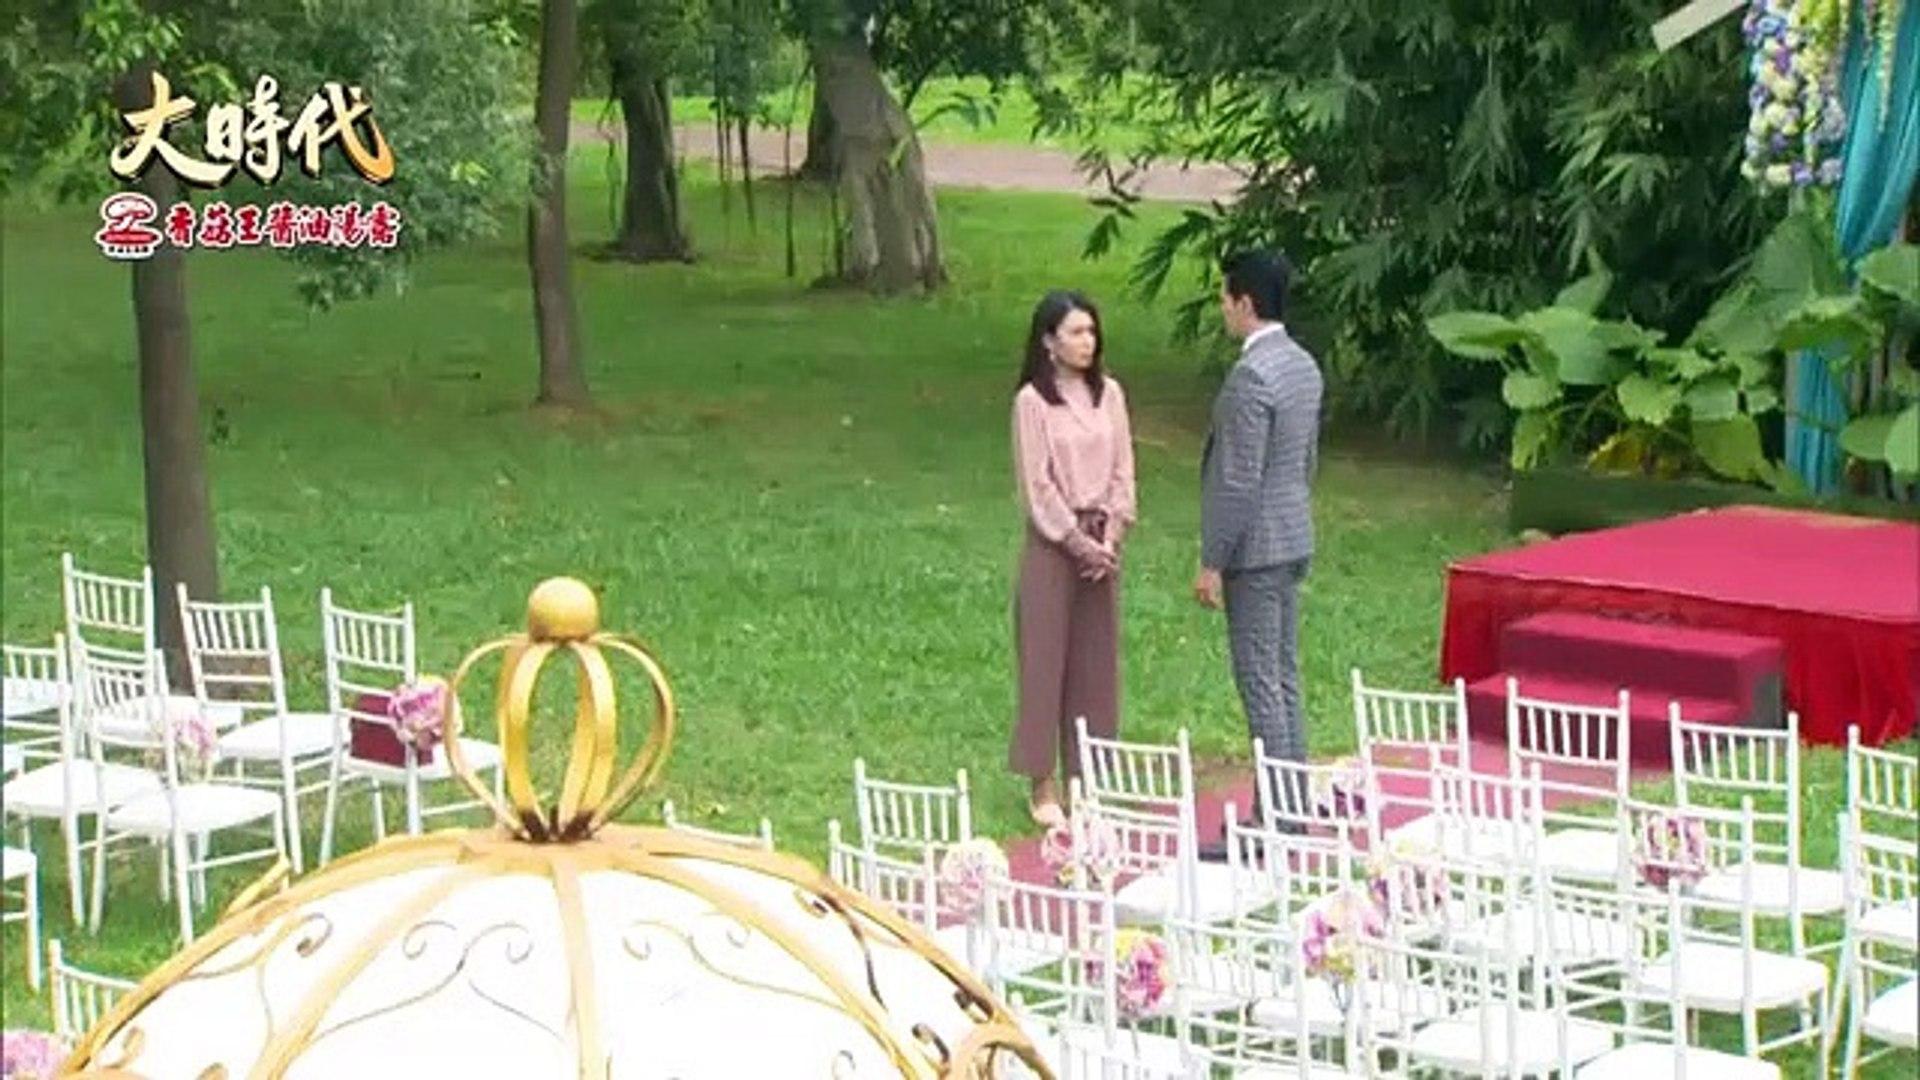 Đại Thời Đại Tập 228 - Phim Đài Loan - THVL1 Lồng Tiếng - Phim Dai Thoi Dai Tap 229 - Phim Dai Thoi